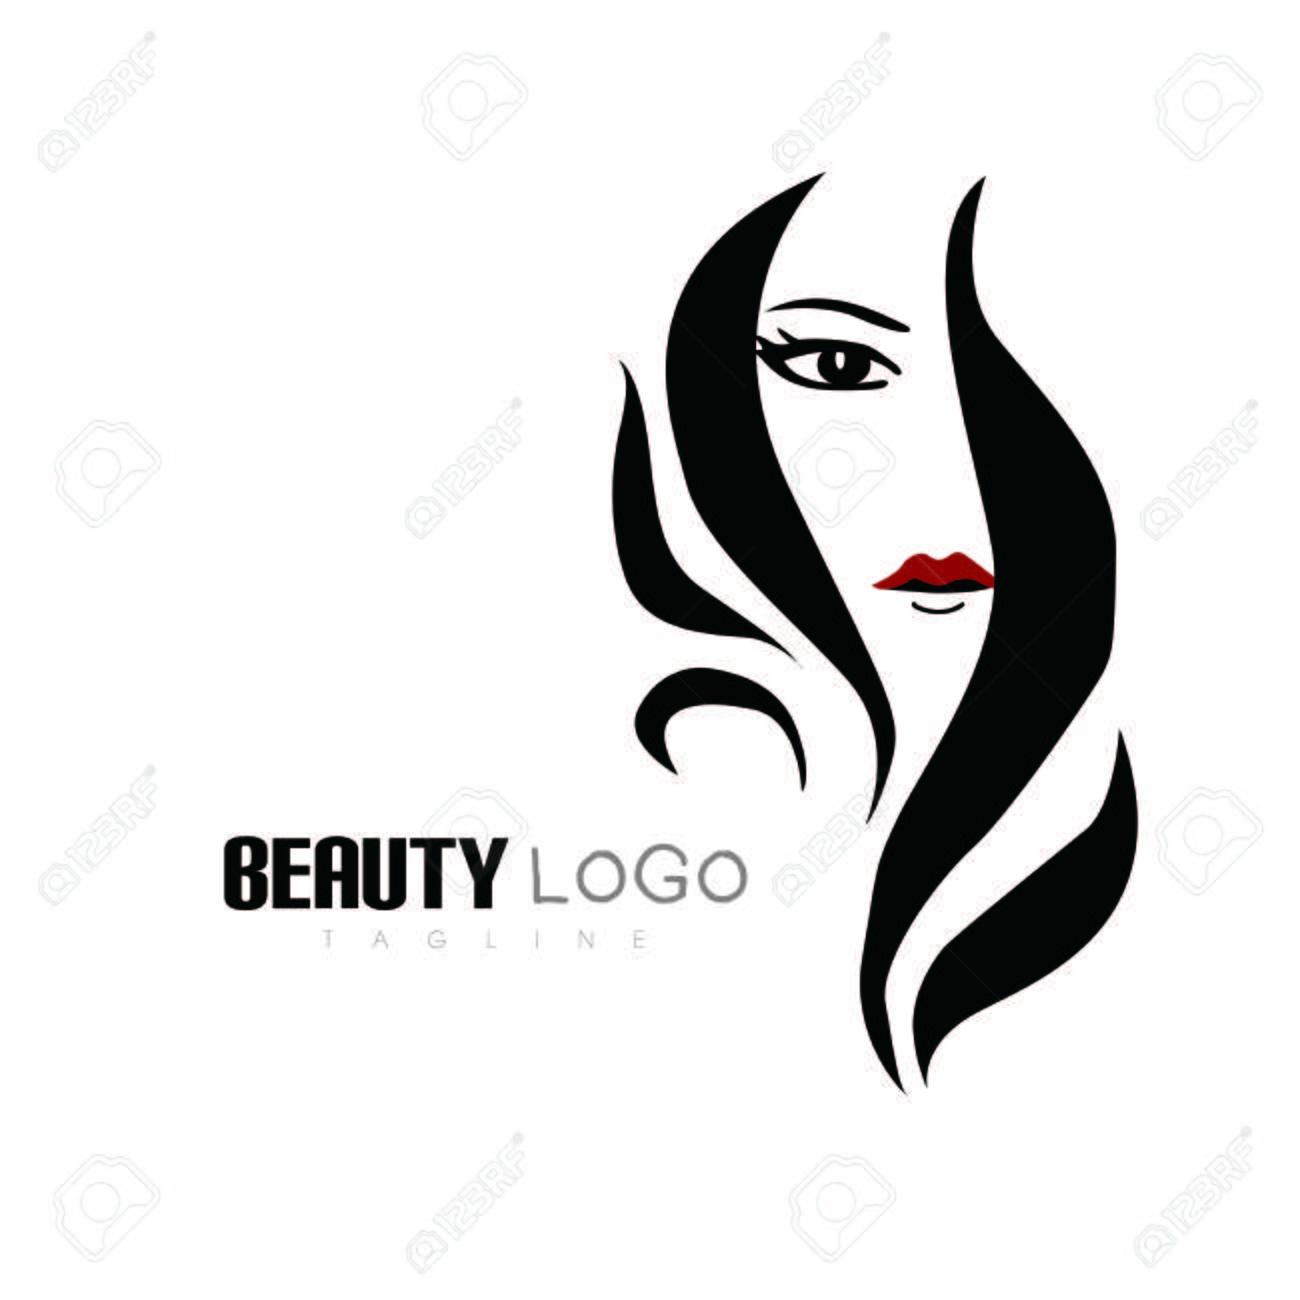 Beauty Hair Salon Logo Salon Logo Royalty Free Cliparts Vectors And Stock Illustration Image 73470304